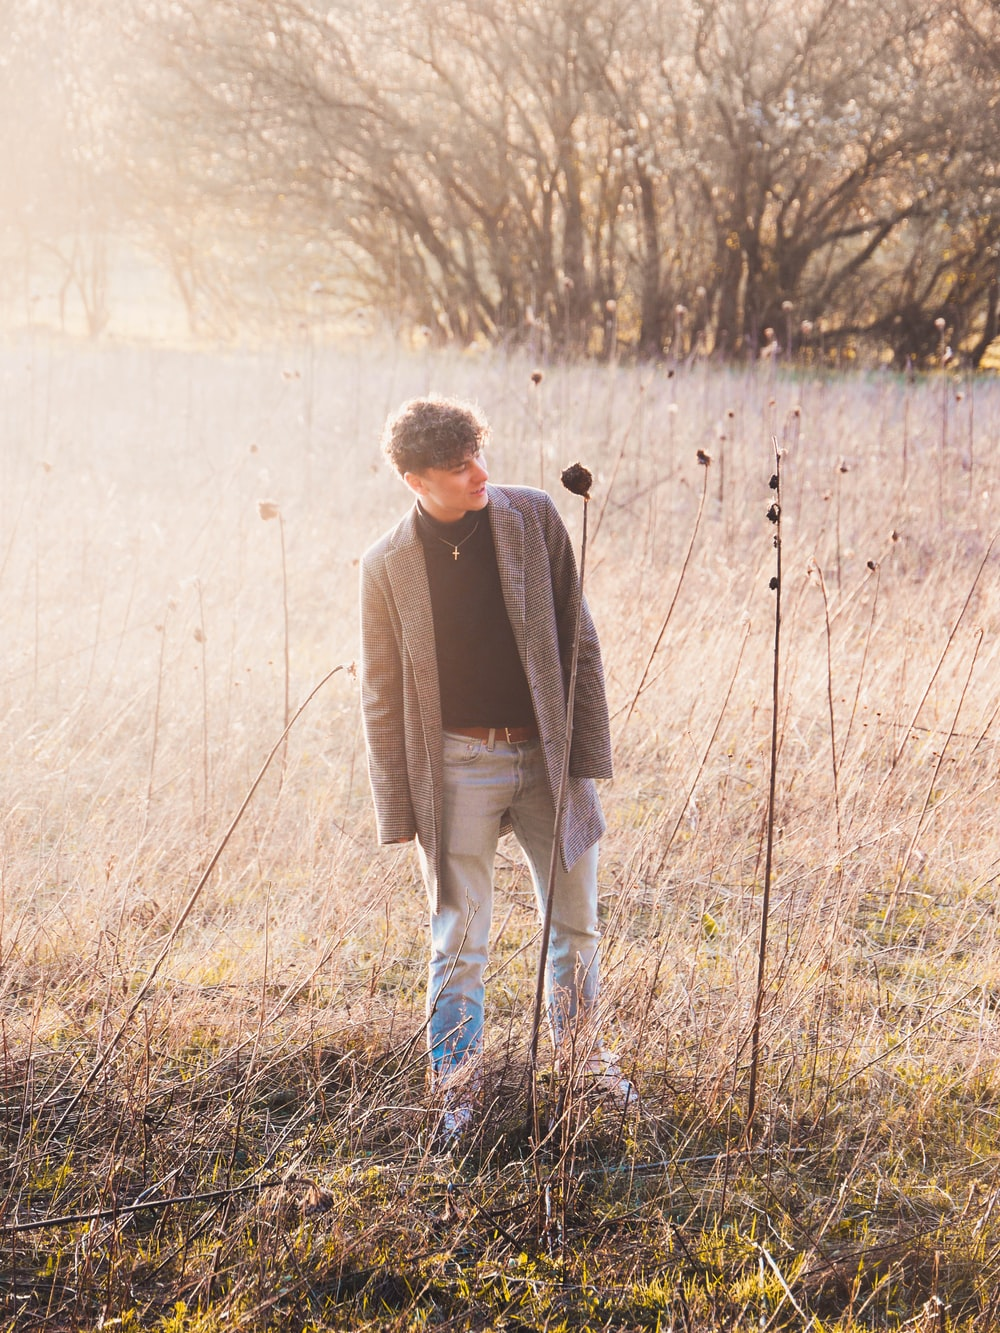 man in brown coat walking on grass field during daytime